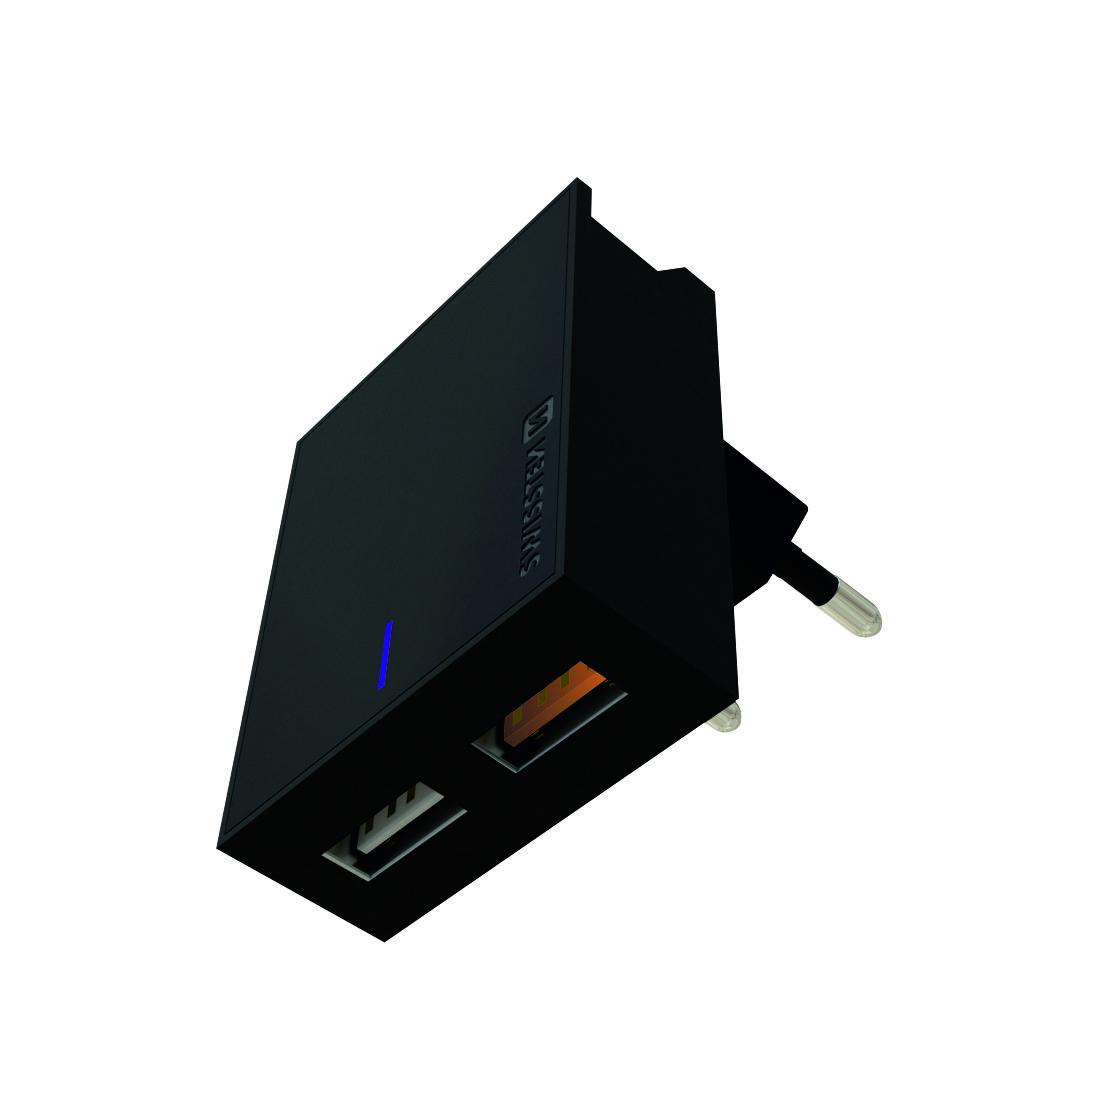 Swissten 22049500 Síťový adaptér QC3.0 23W černý